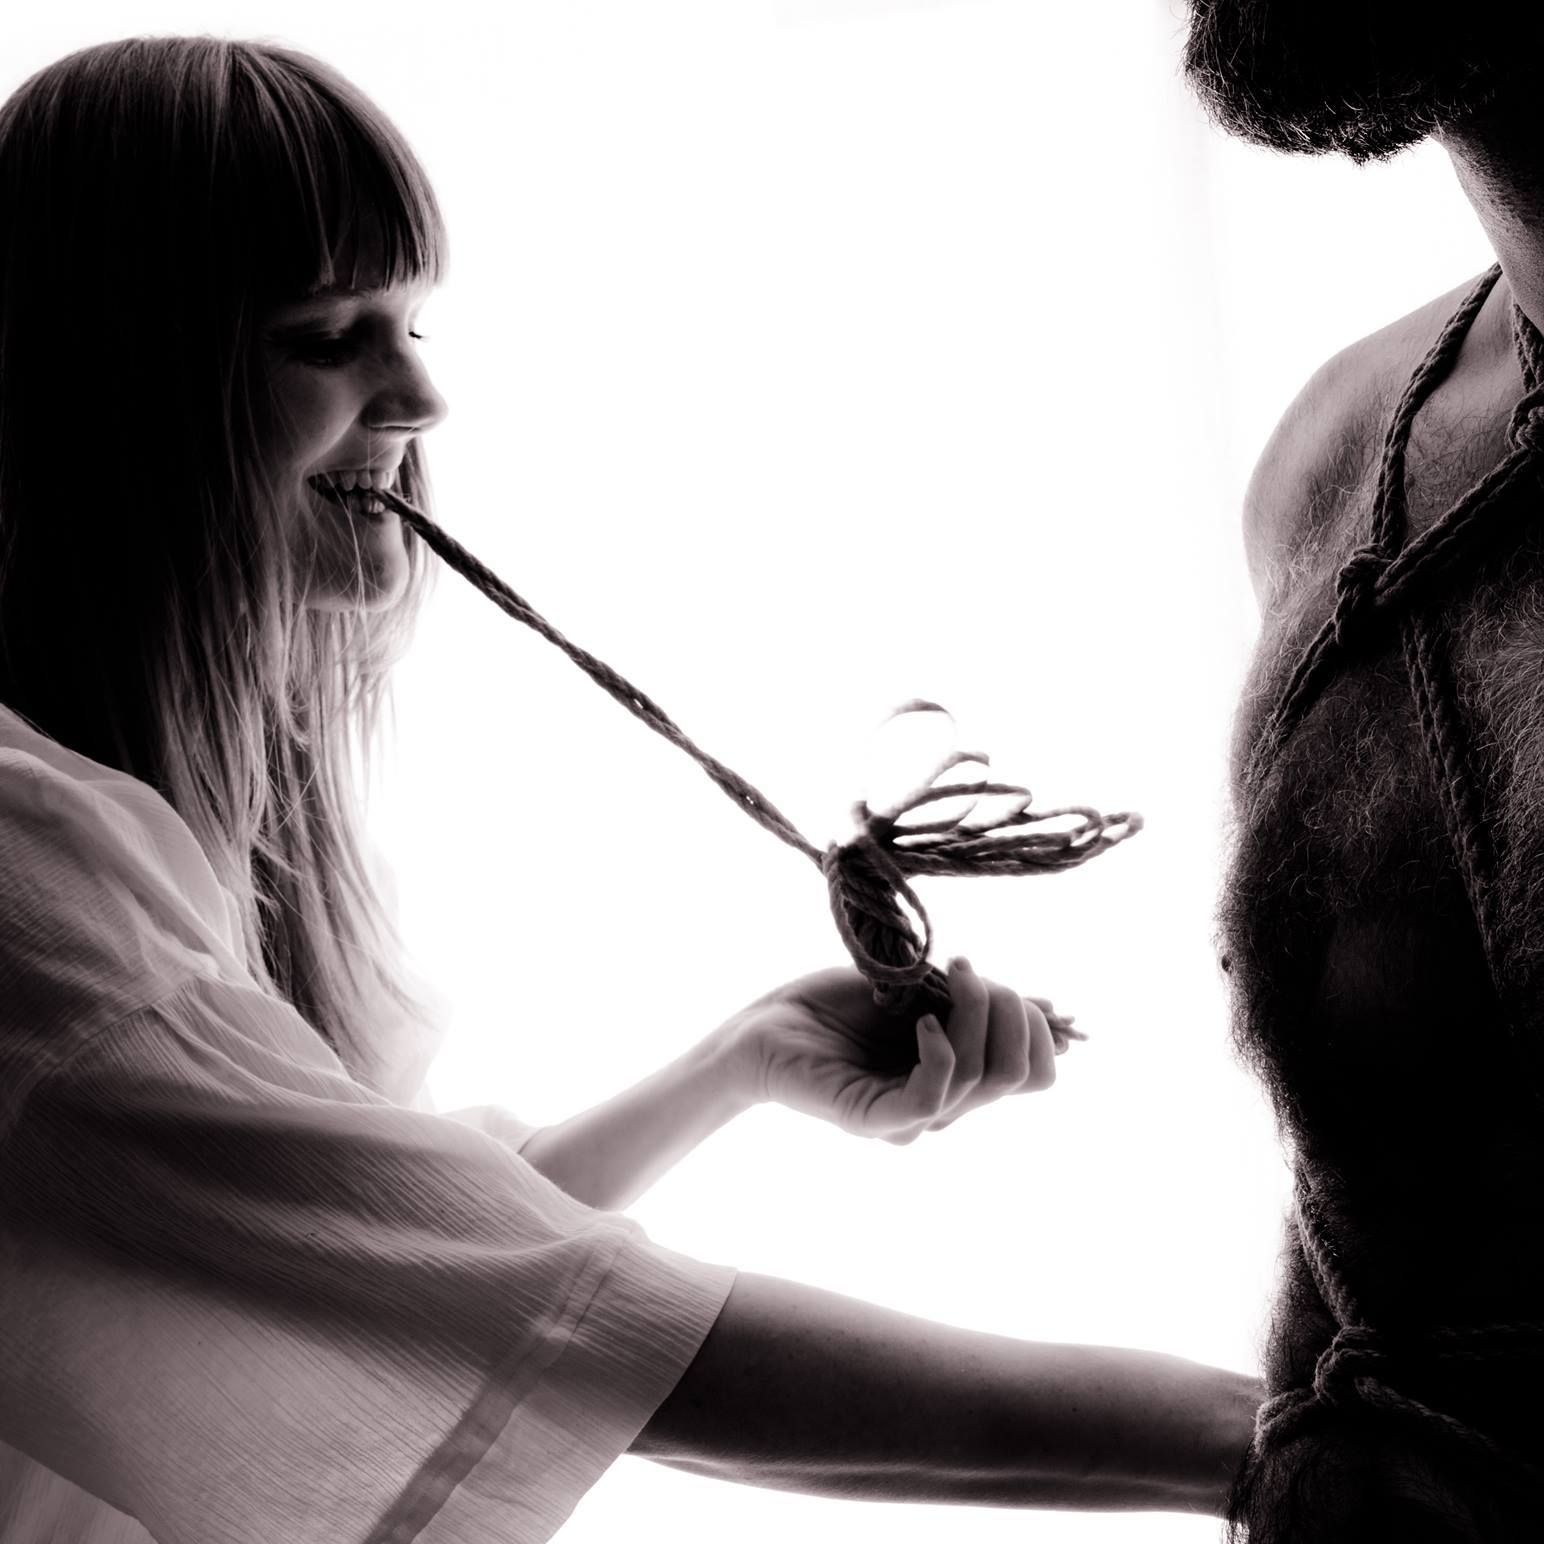 Molly Lee - Copenhagen, DenmarkWorkshops // Tuition // SessionsModelling // Performance // Artistic Workfetlife // instaropework: Molly Leephoto: Nude Art Photo